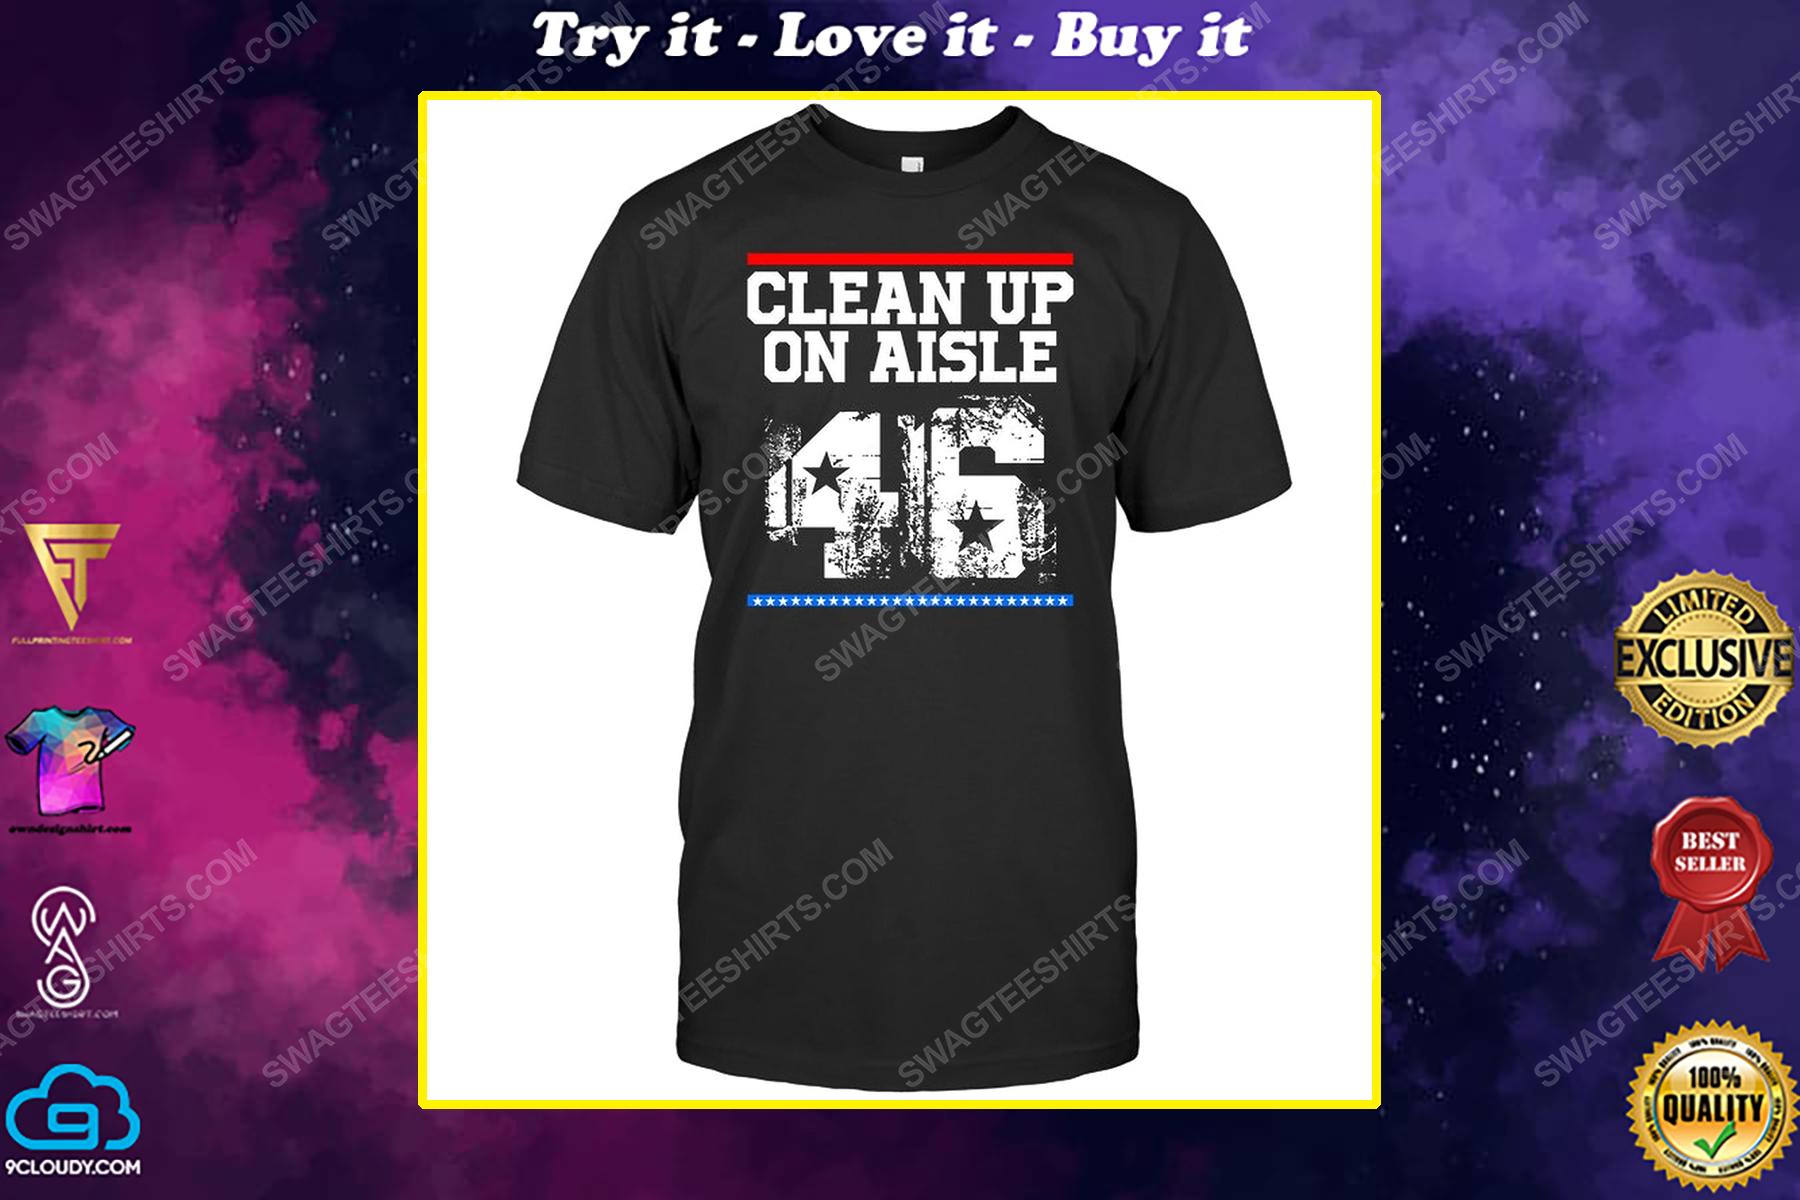 Clean up on aisle 46 political shirt